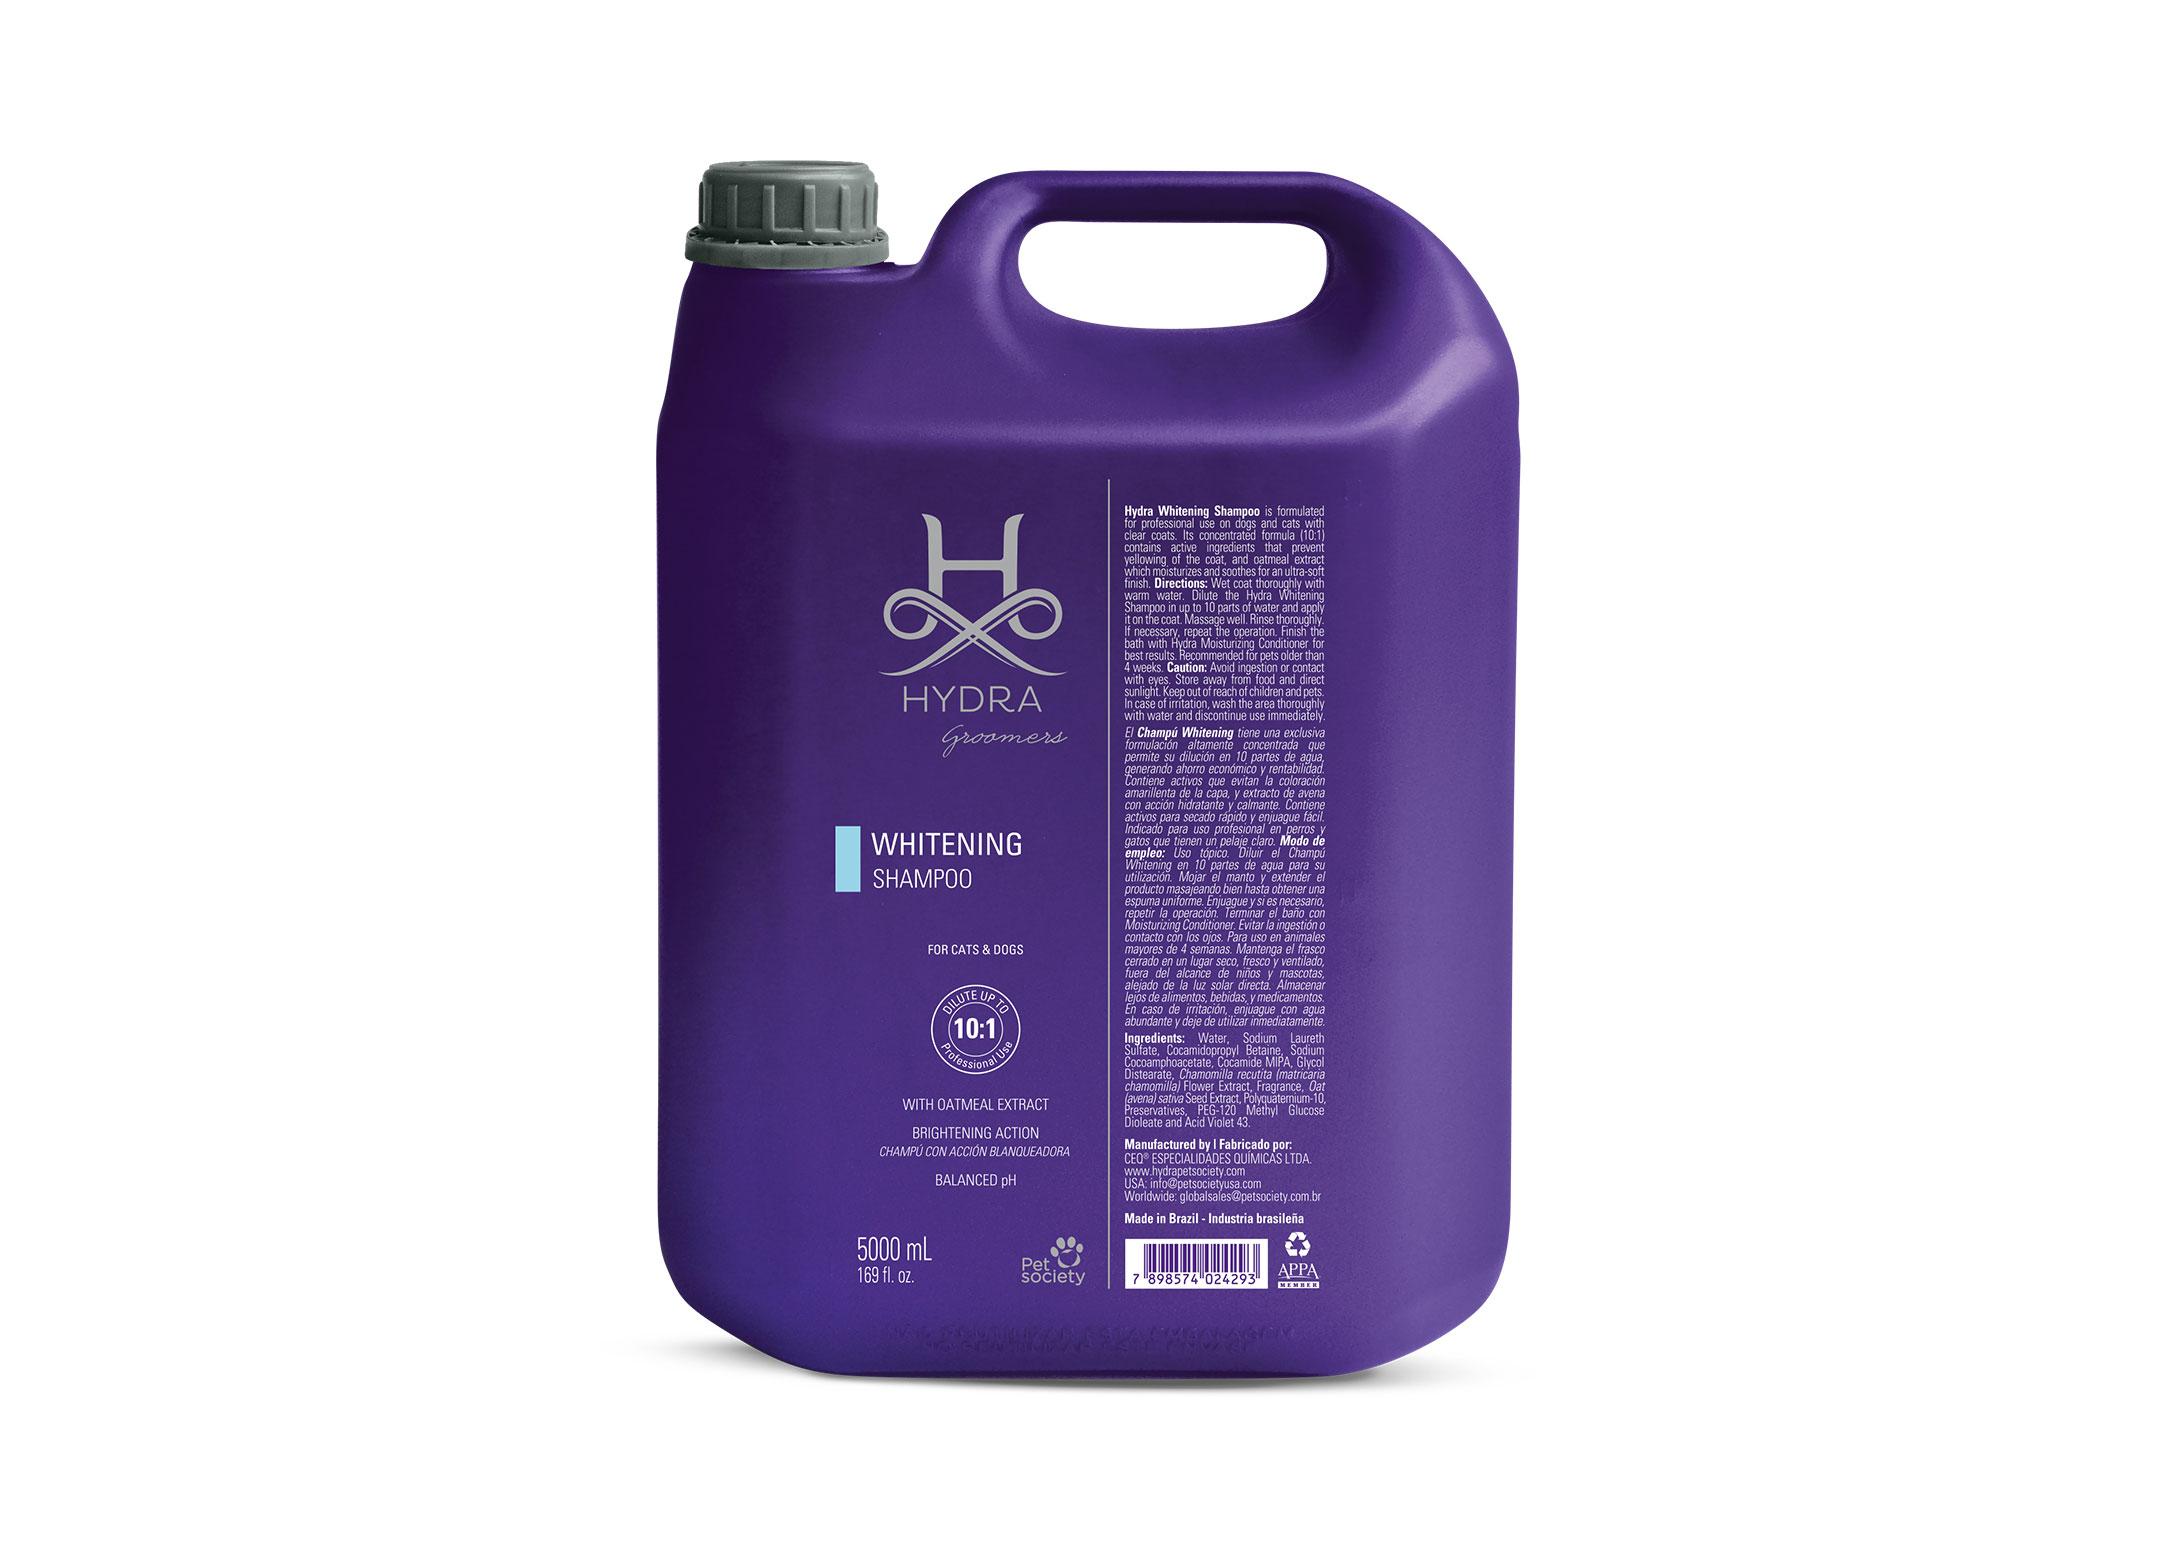 Hydra Whitening Shampoo